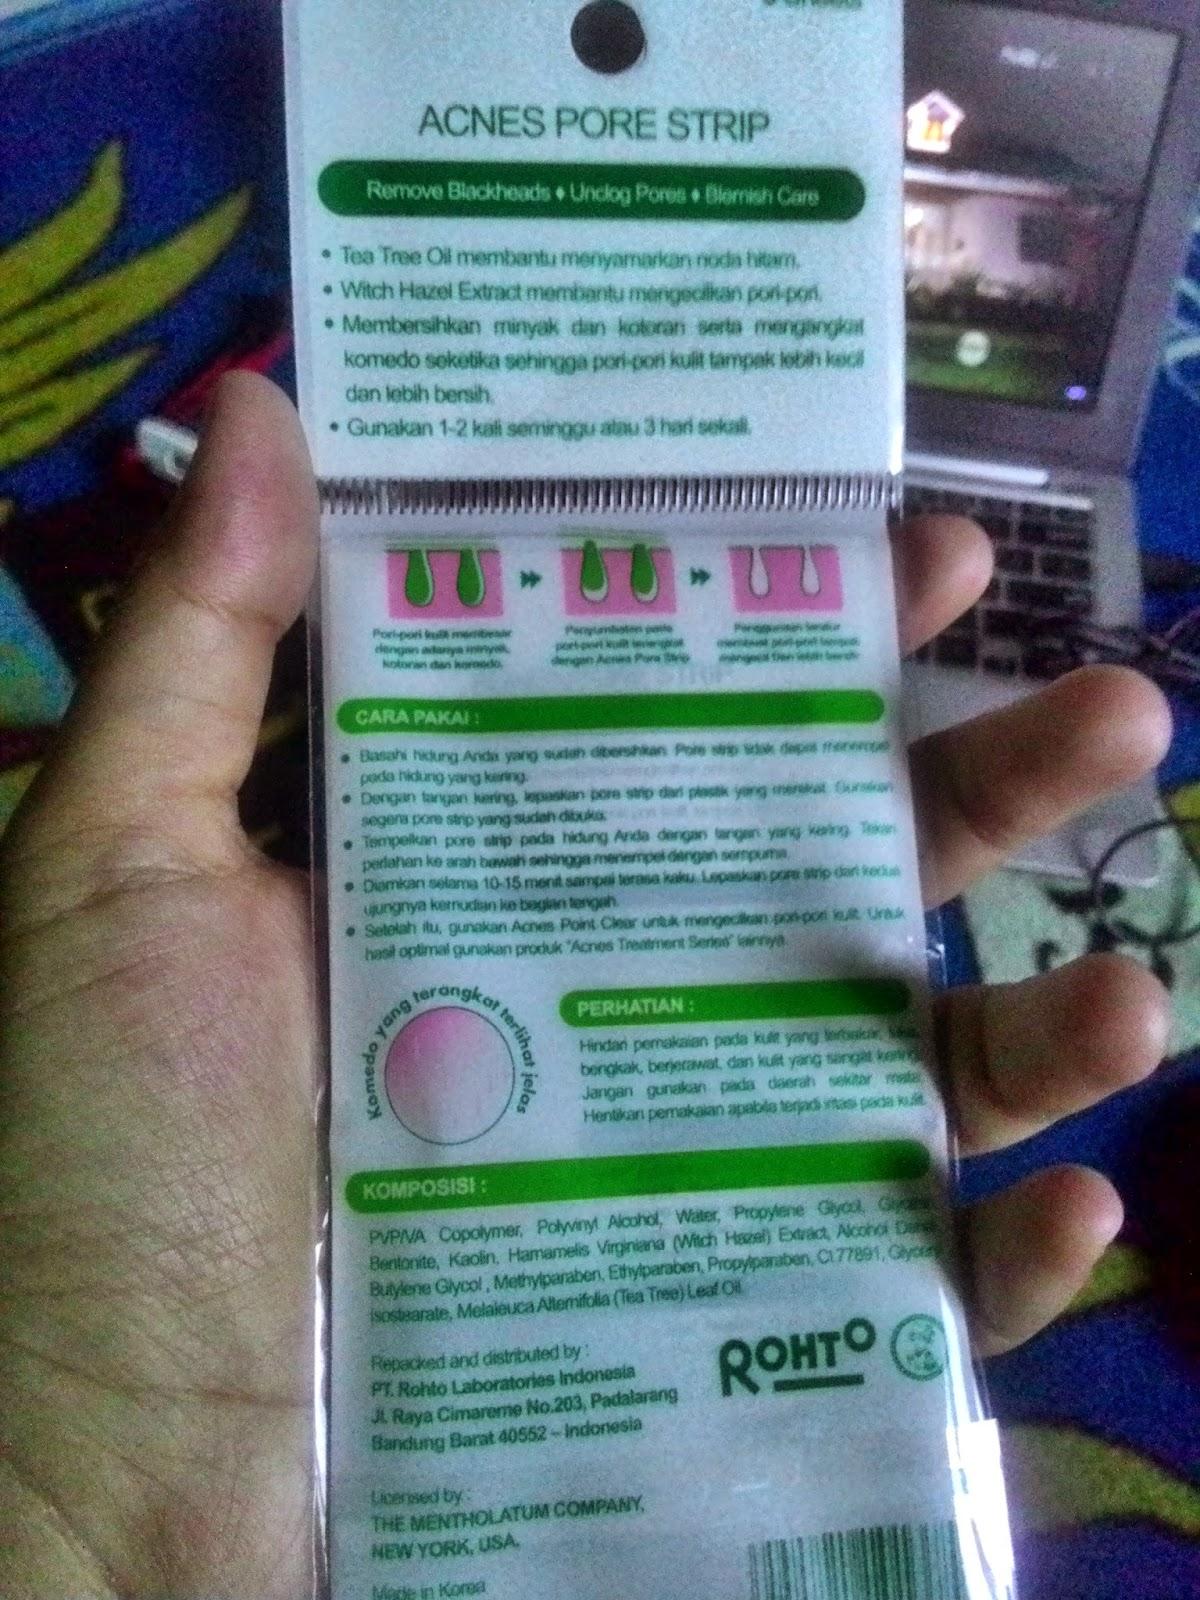 Inongsomniac Review Produk Mentholatum Acnes Treatment Starter Pack Paket Perawatan Kulit Wajah Berjerawat Jerawat Washing Bar